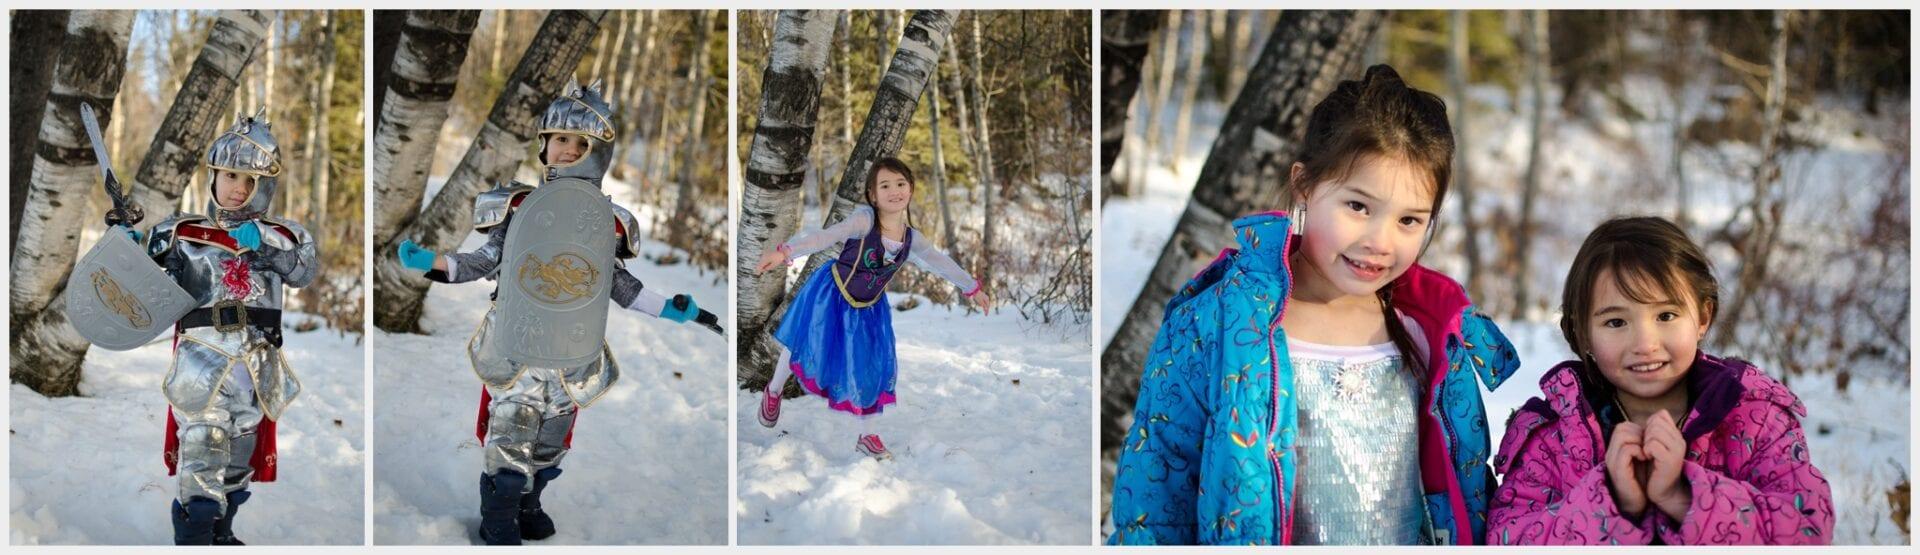 Winter-Family-Portrait-Session-001